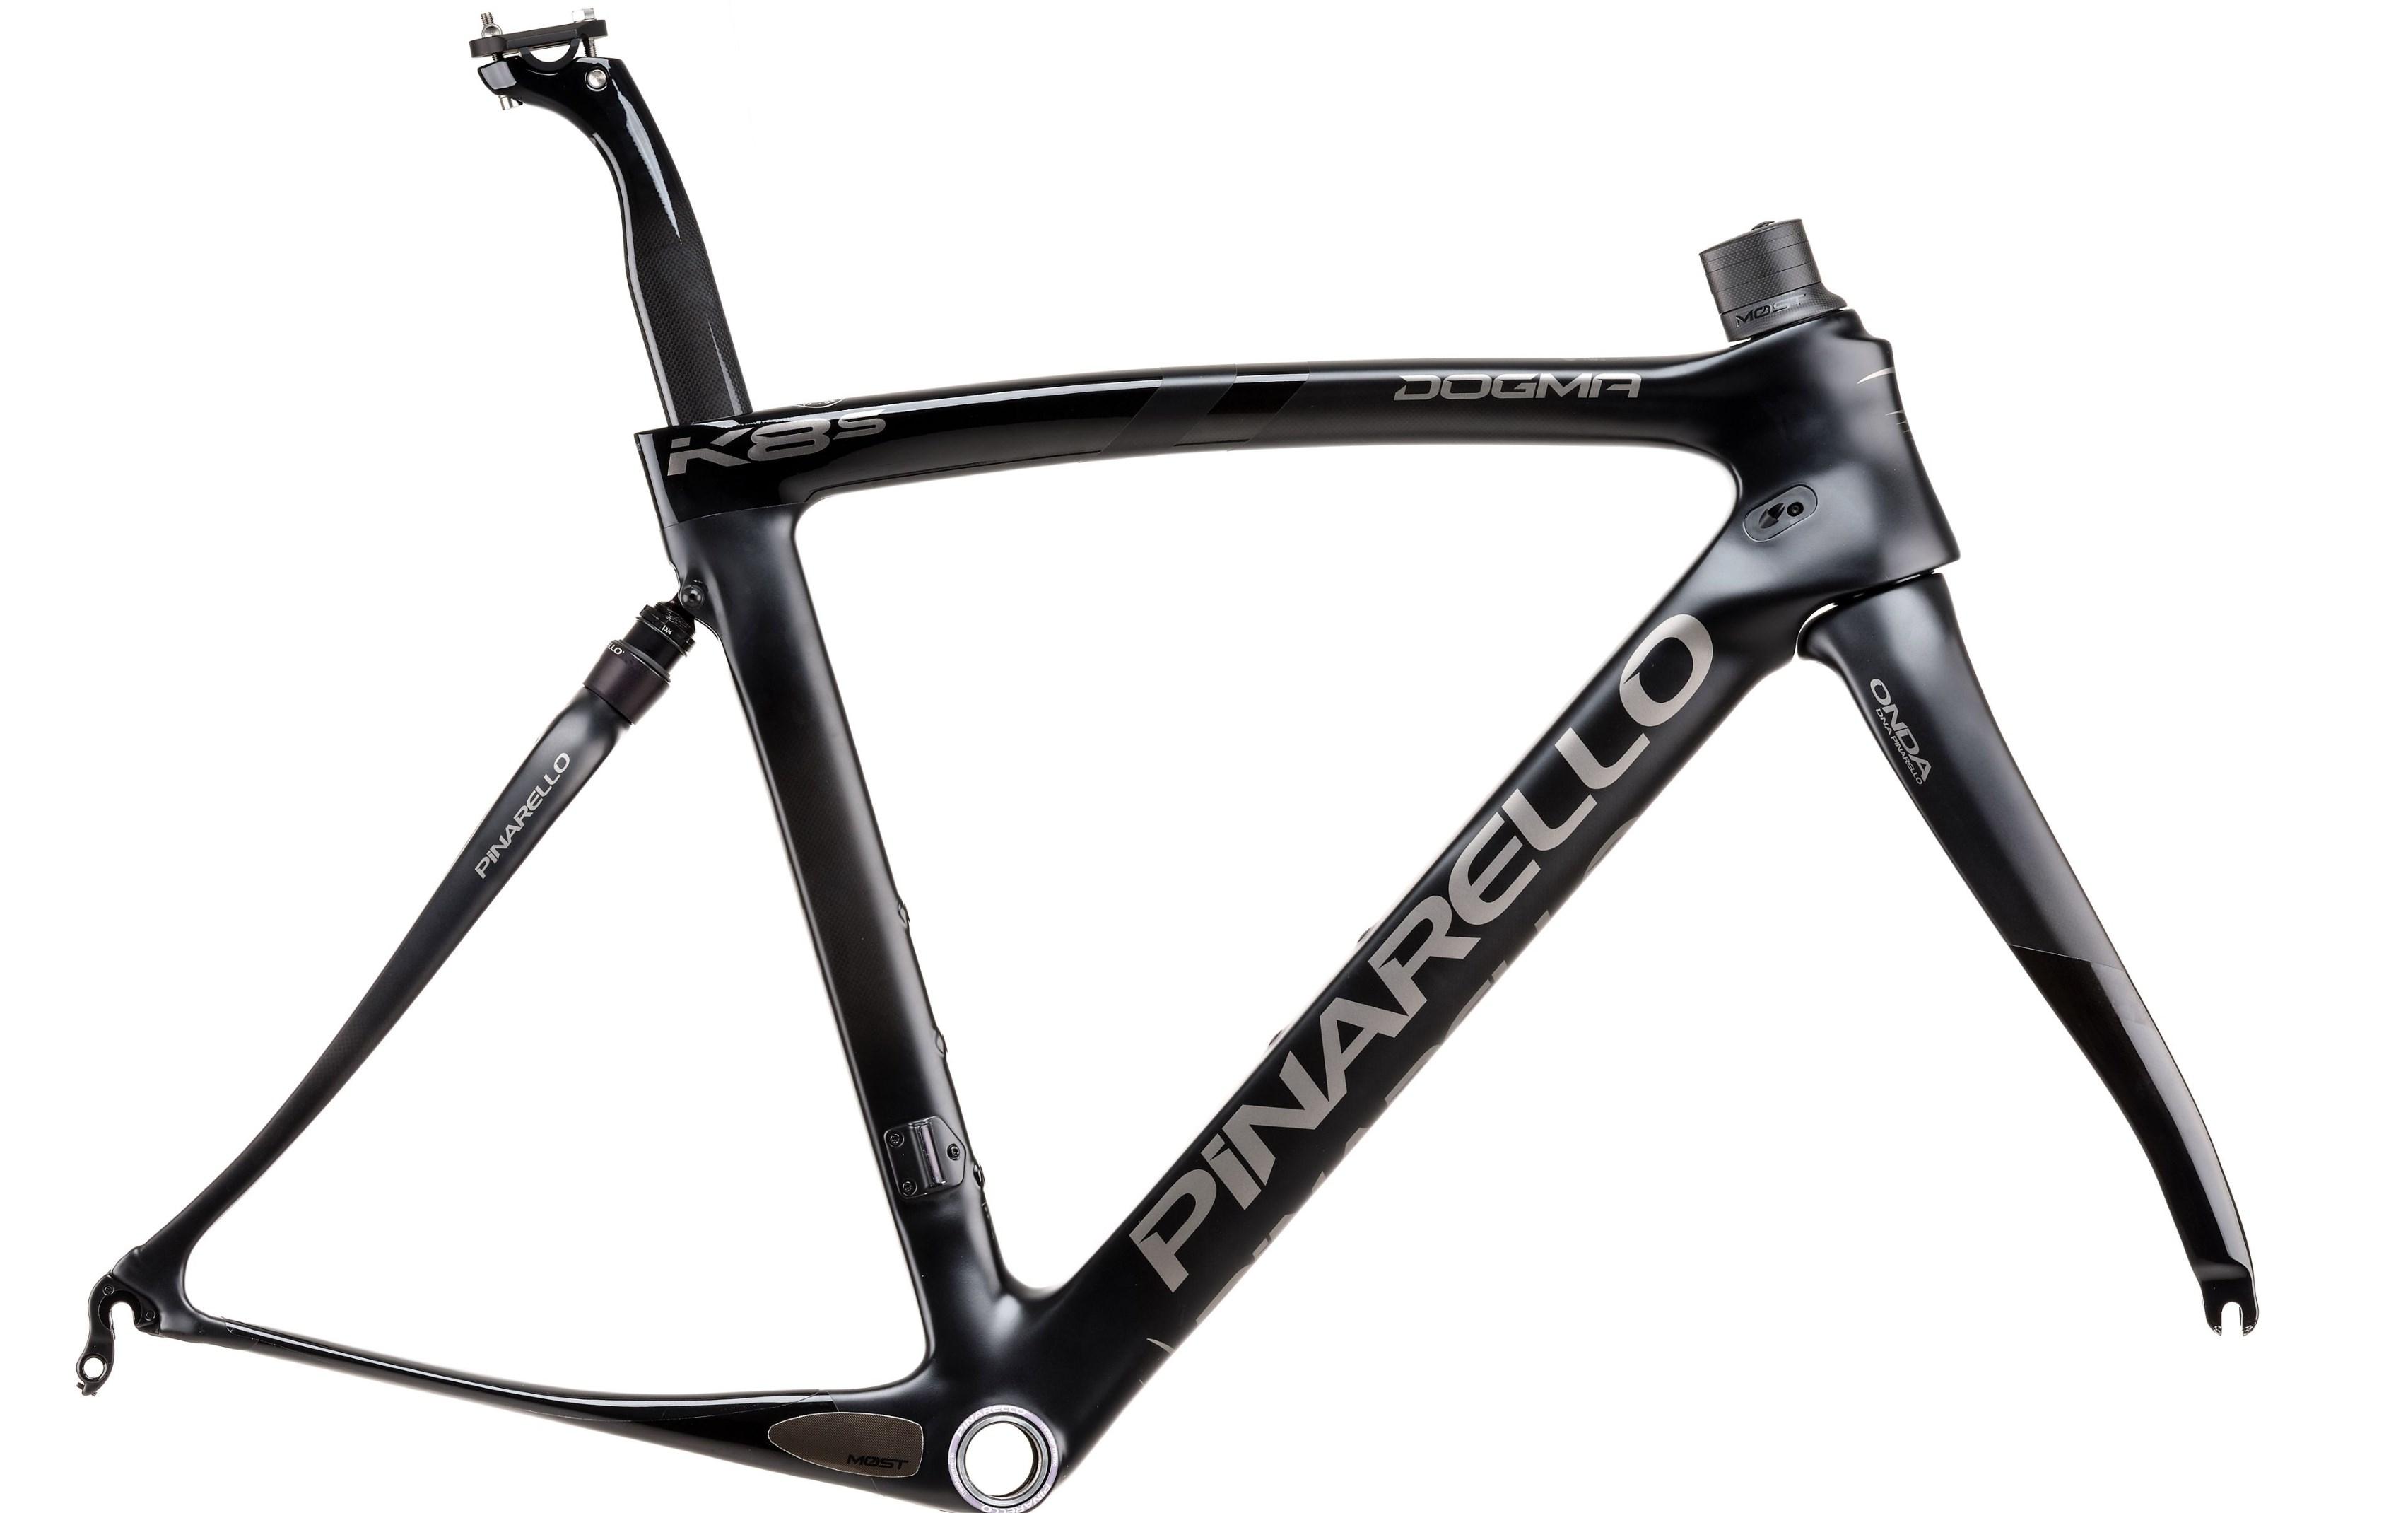 Kit cadre vélo Pinarello Dogma K8S